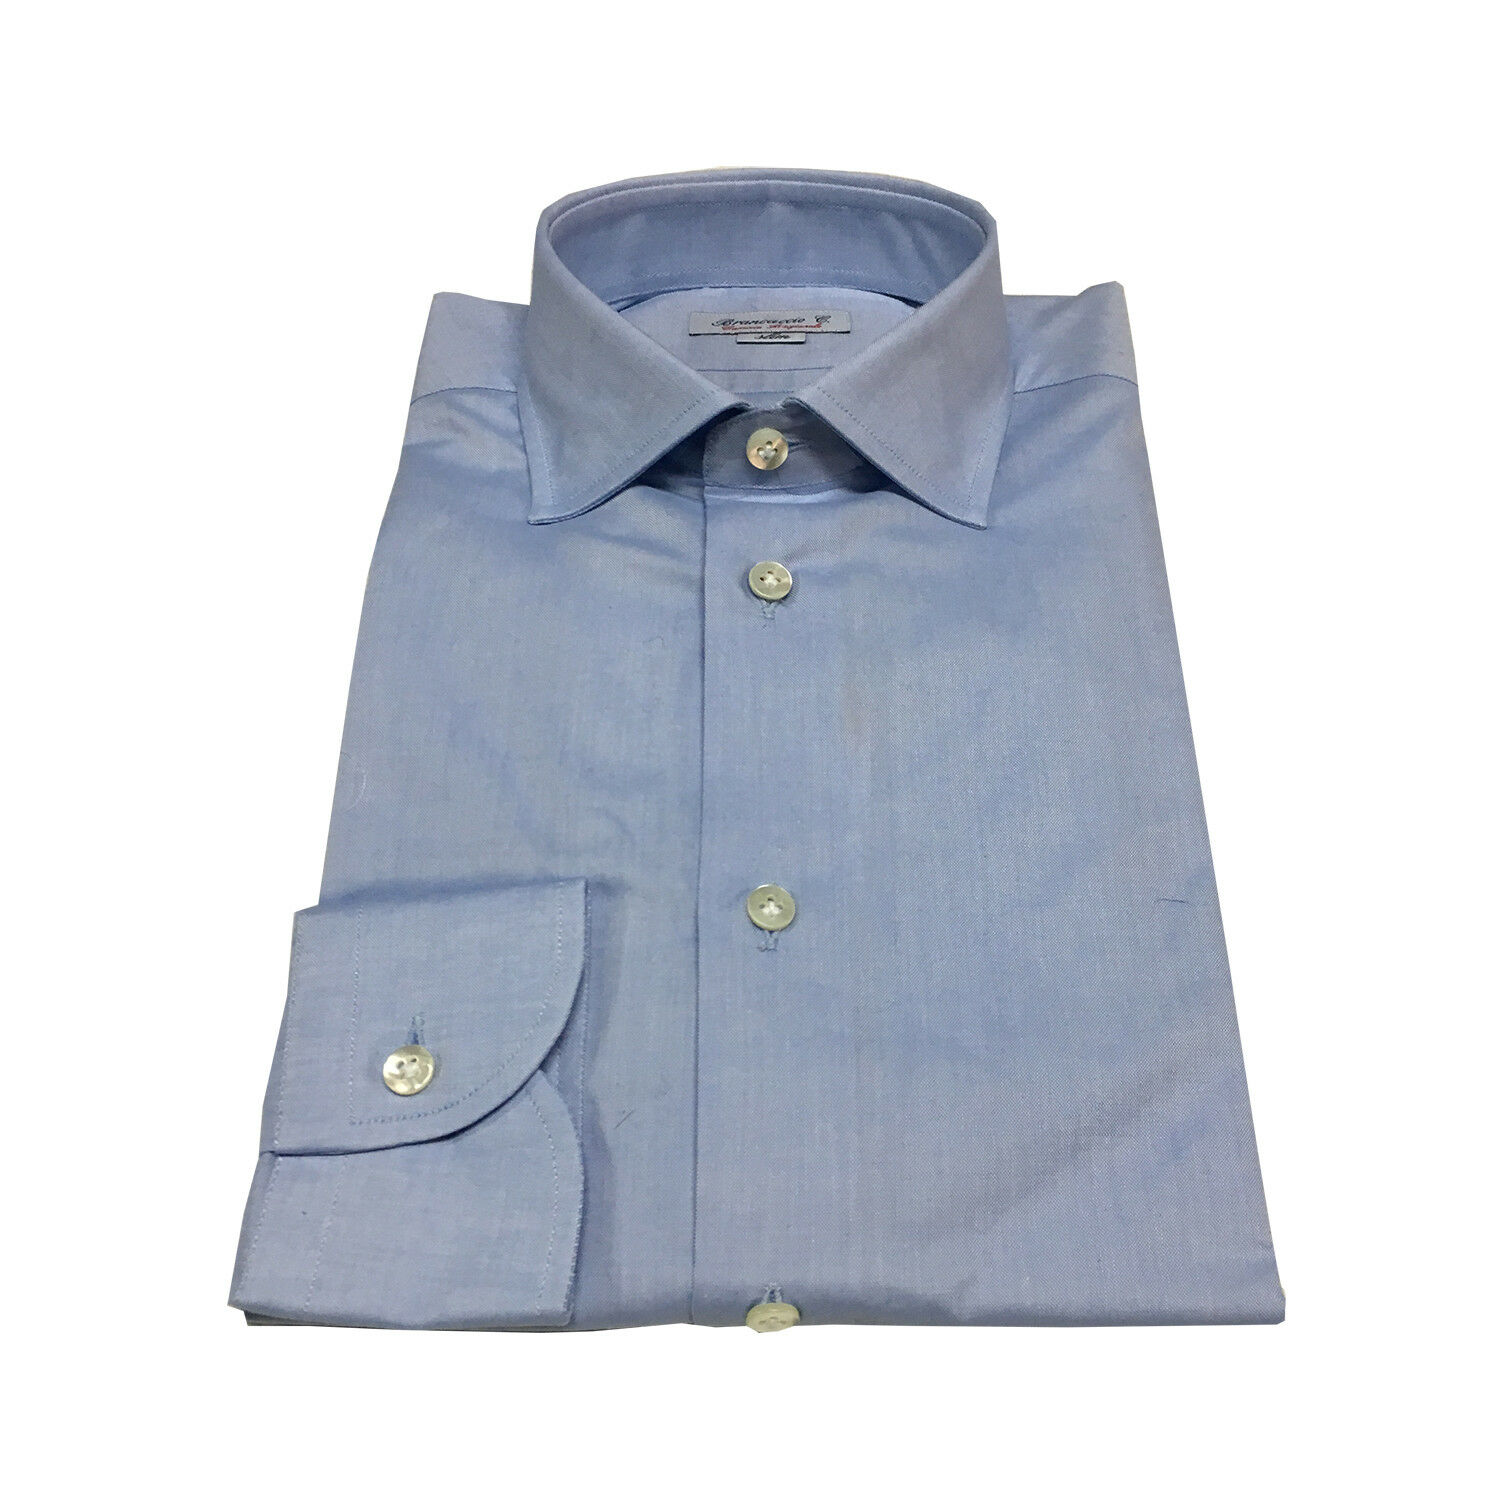 Brancaccio Men's Shirts Baby bluee 100% Cotton